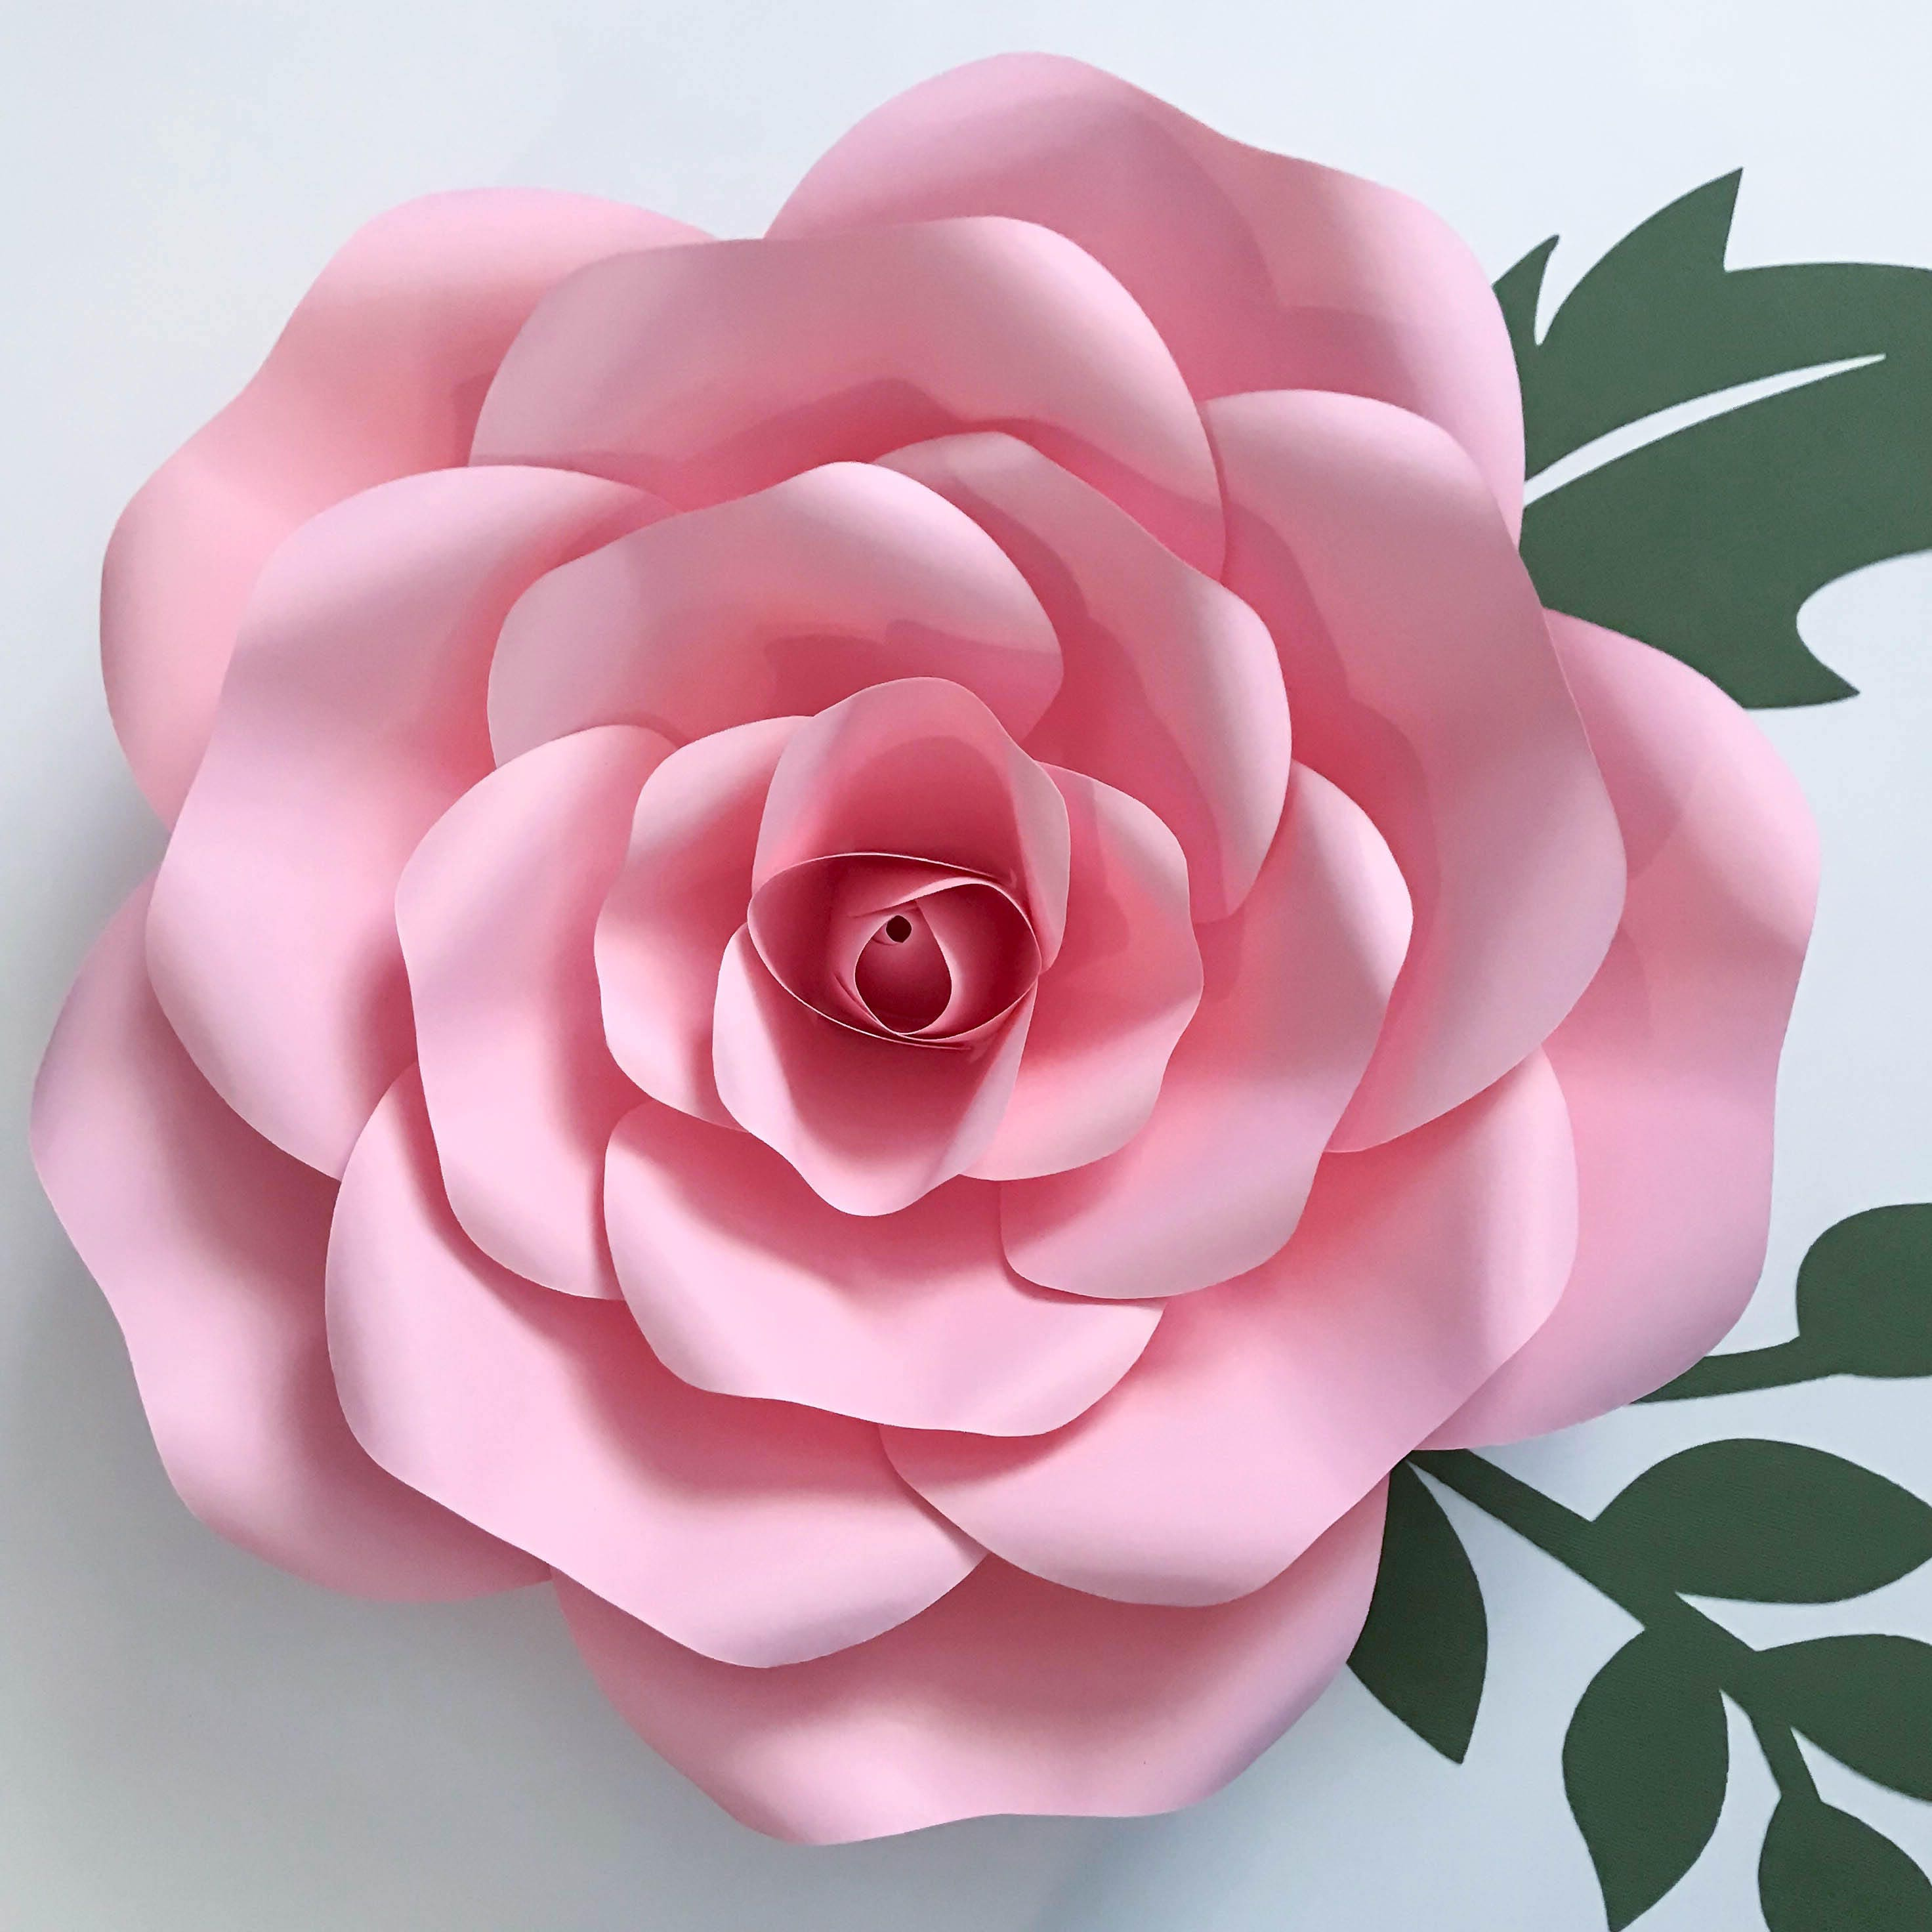 paper flowers pdf petal  155 exquisite rose flower template with base digital version original